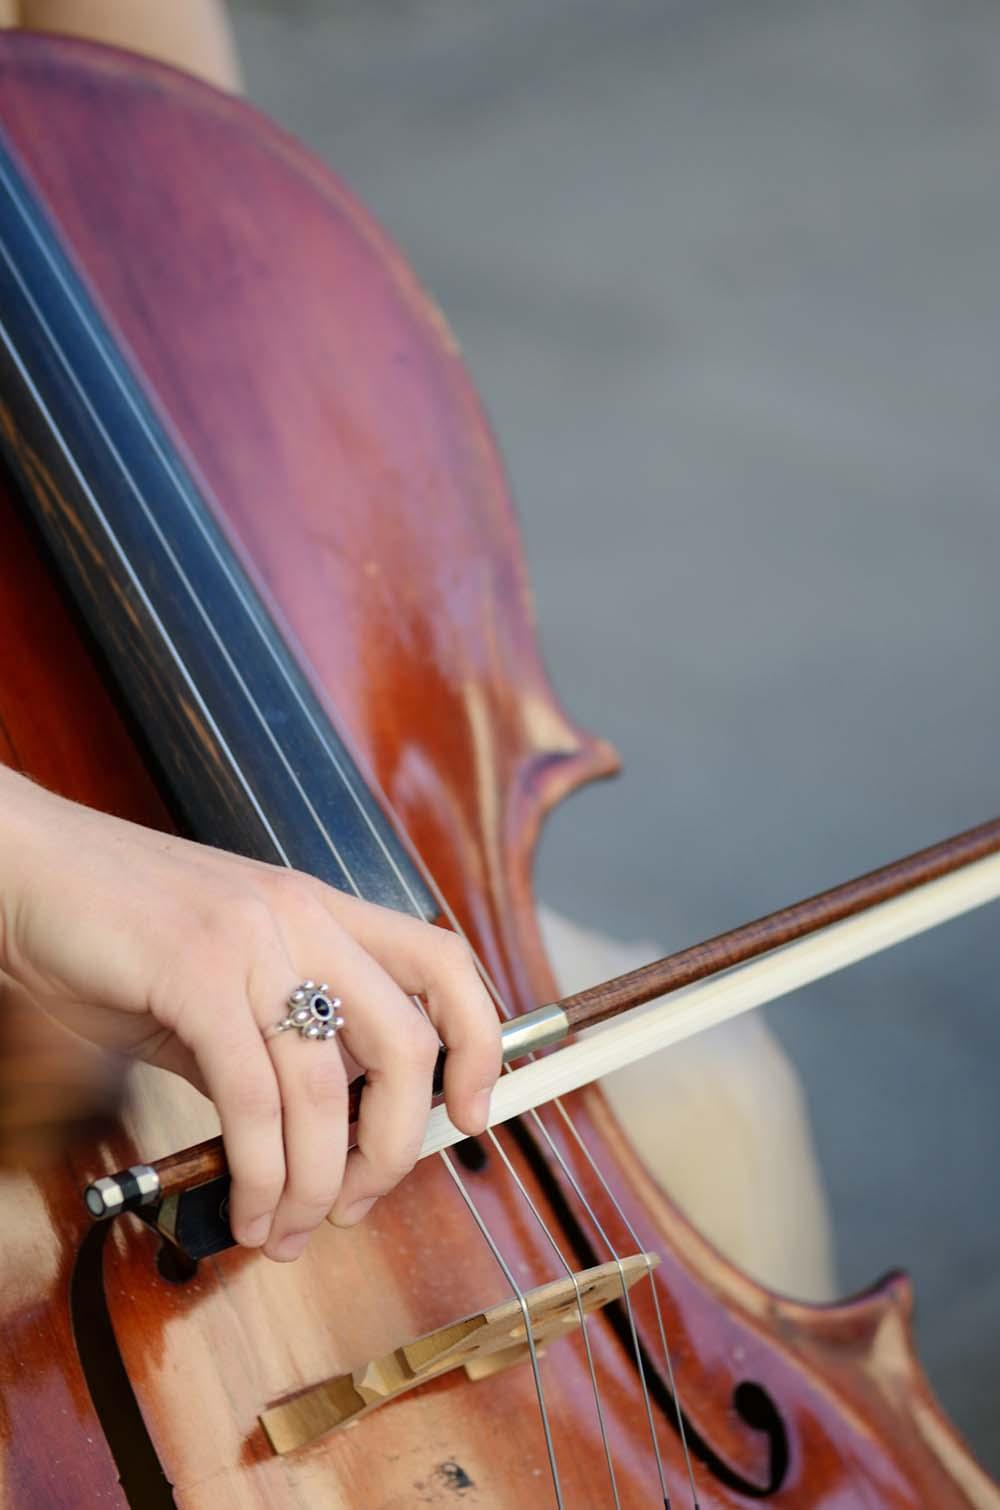 cellist-cello-classical-music-37719